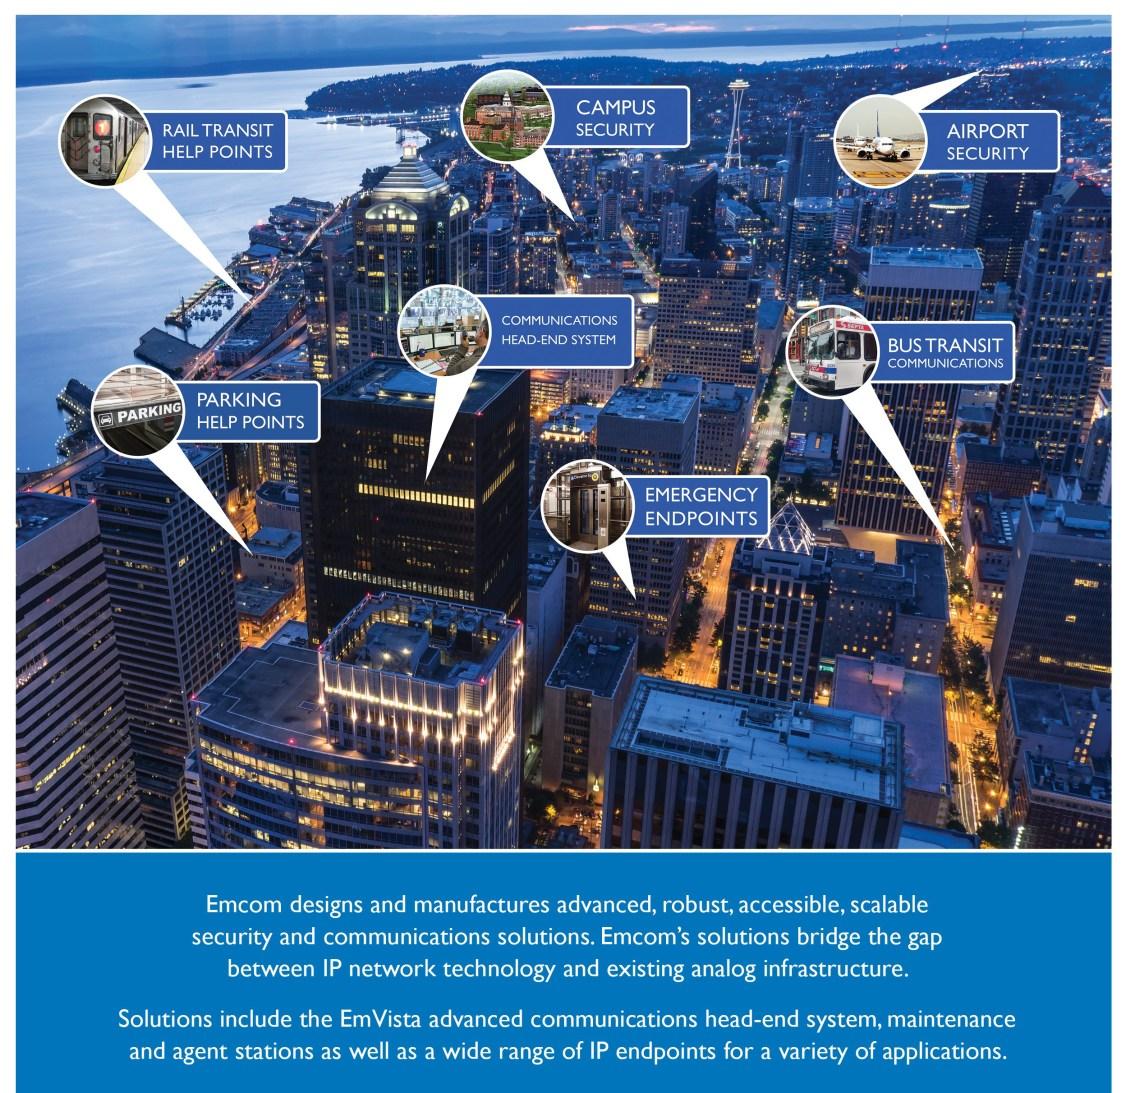 Emcom Security-Communication Solutions